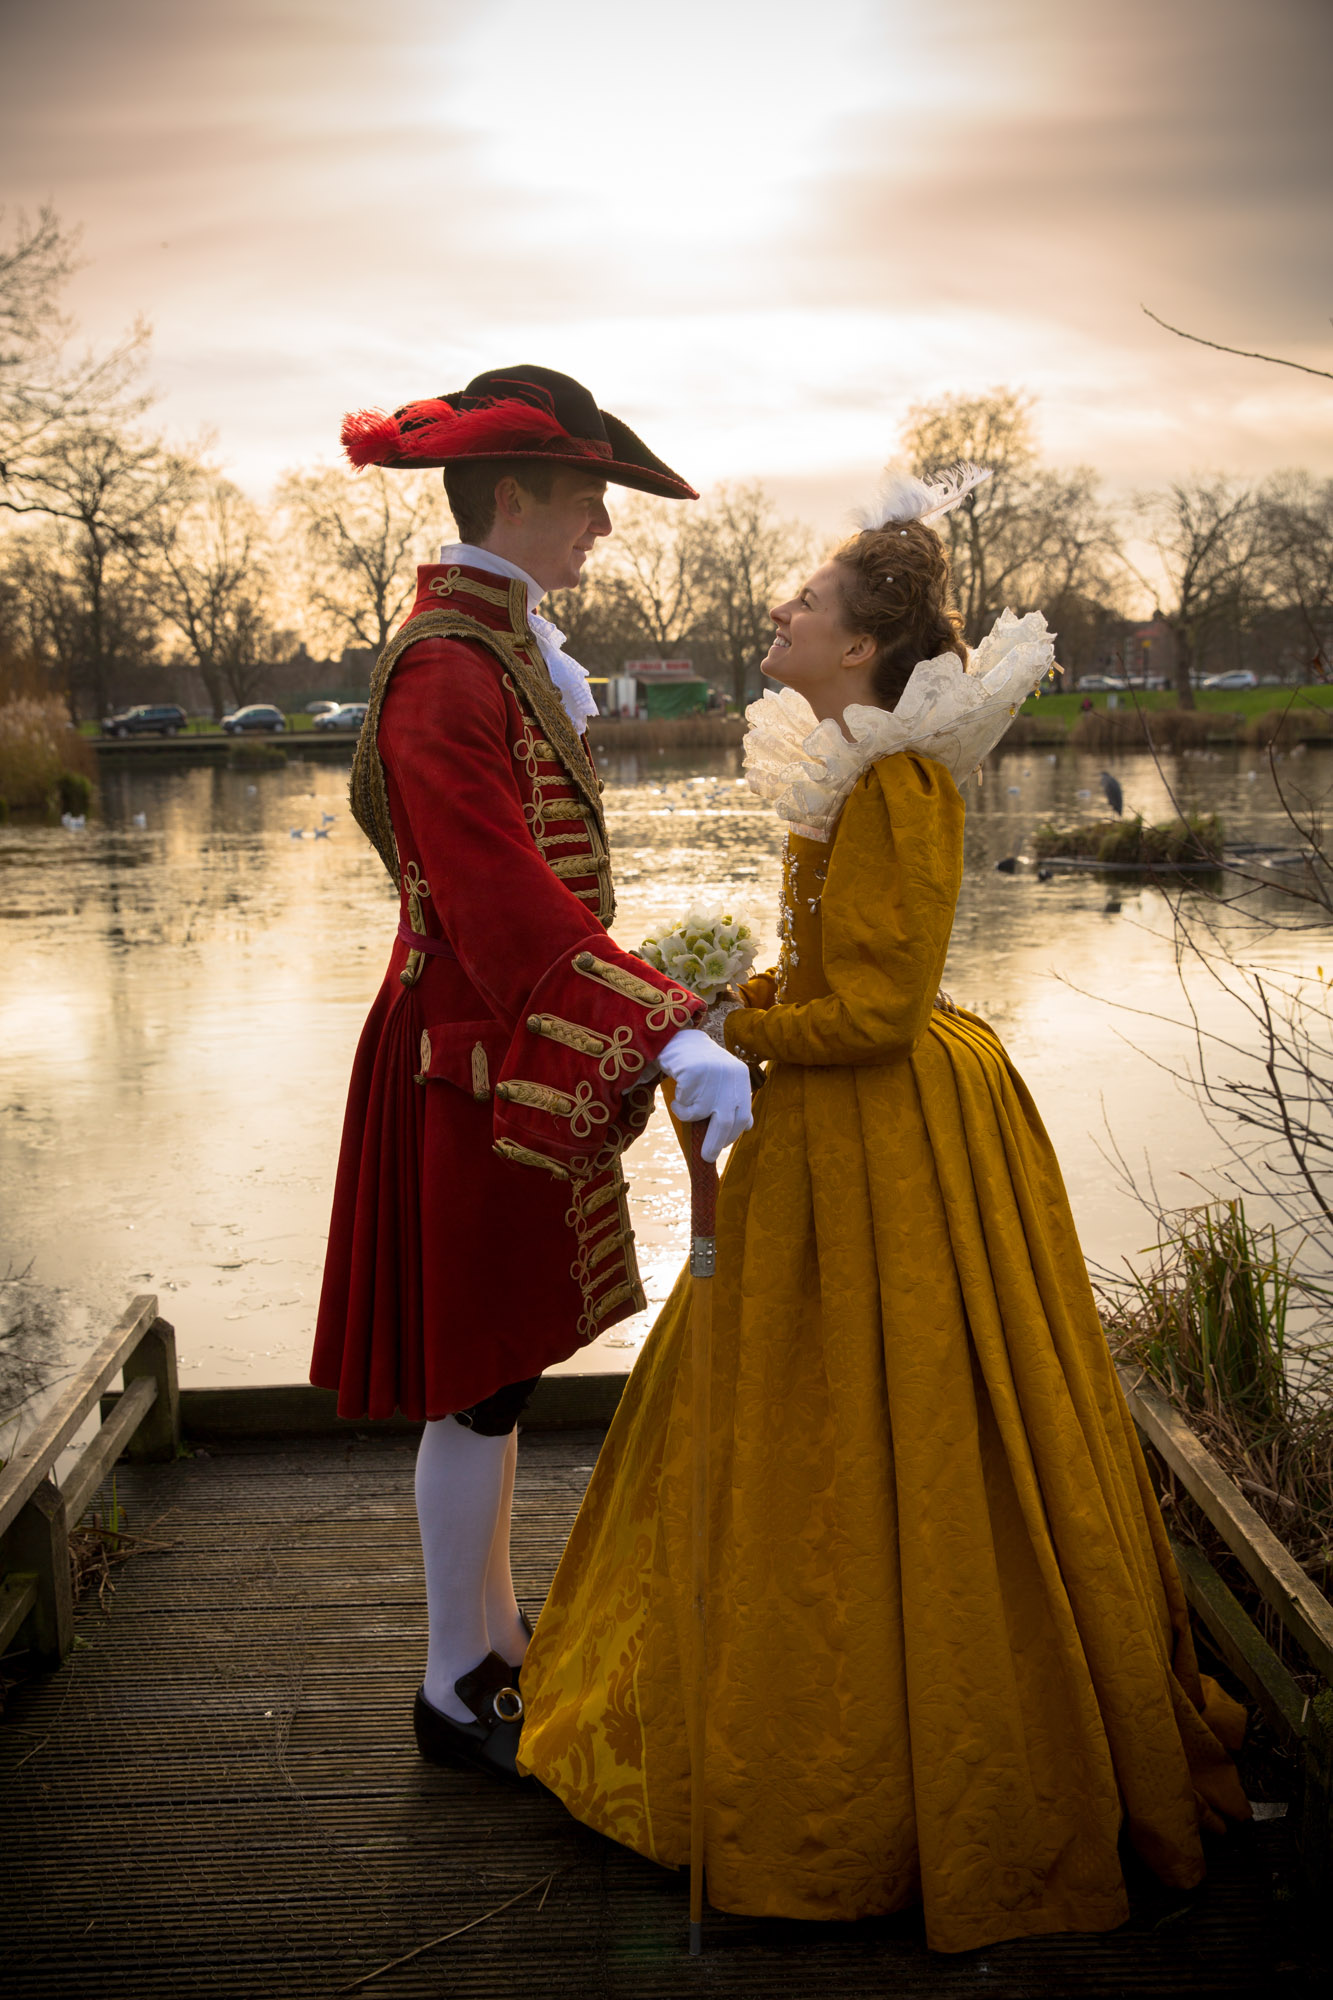 weddings-couples-love-photographer-oxford-london-jonathan-self-photography-60.jpg